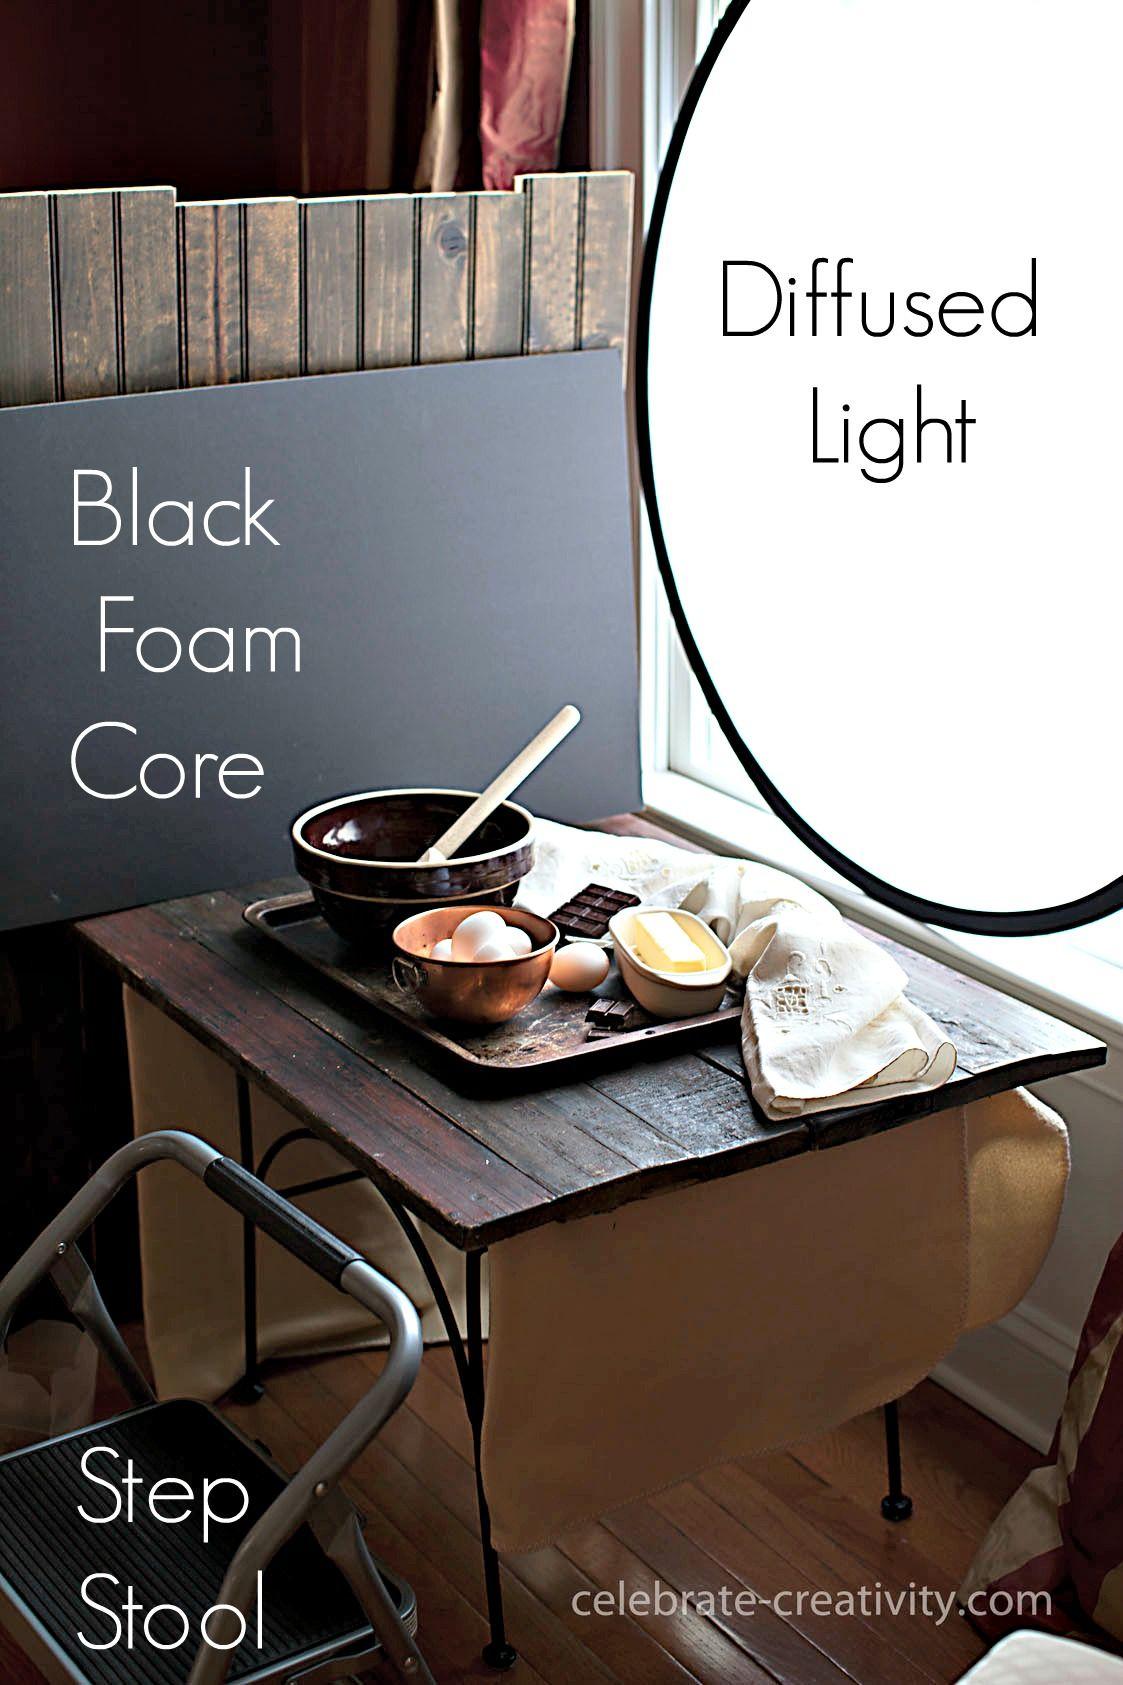 Dark Food Photography Dark Food Photography Food Photography